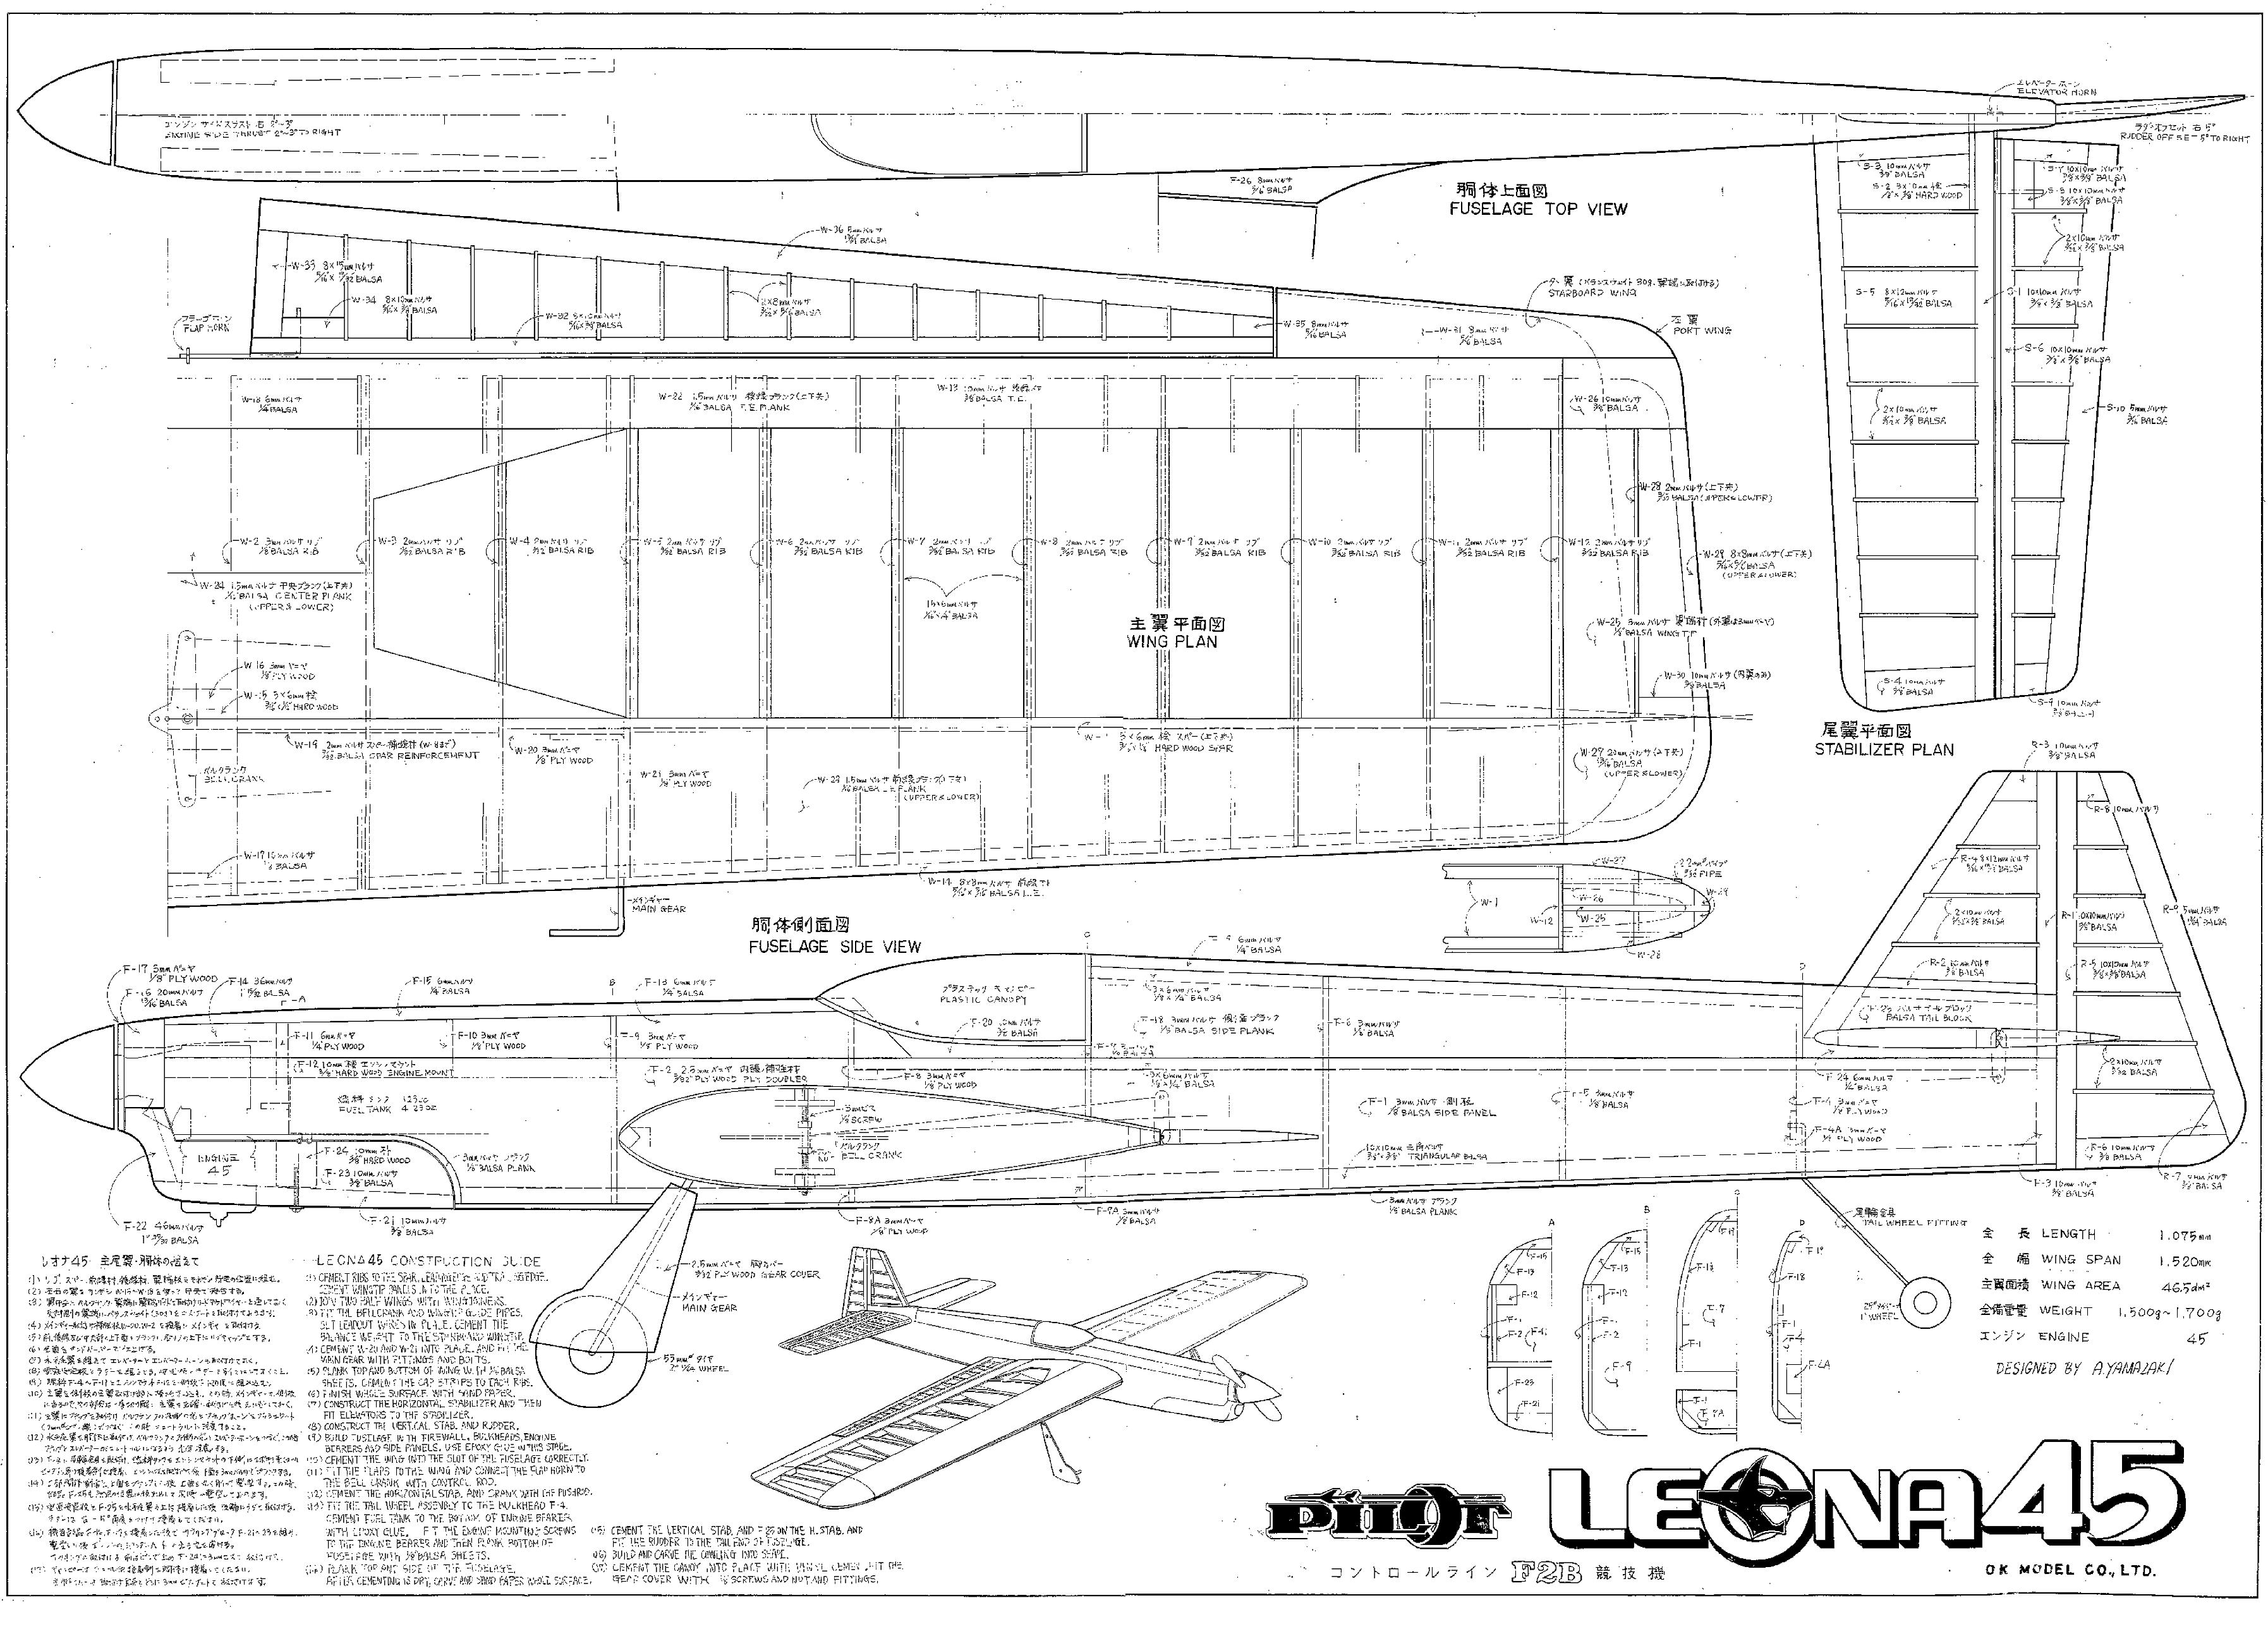 Leona 20 - japanese aerobatic model - any pics or infos